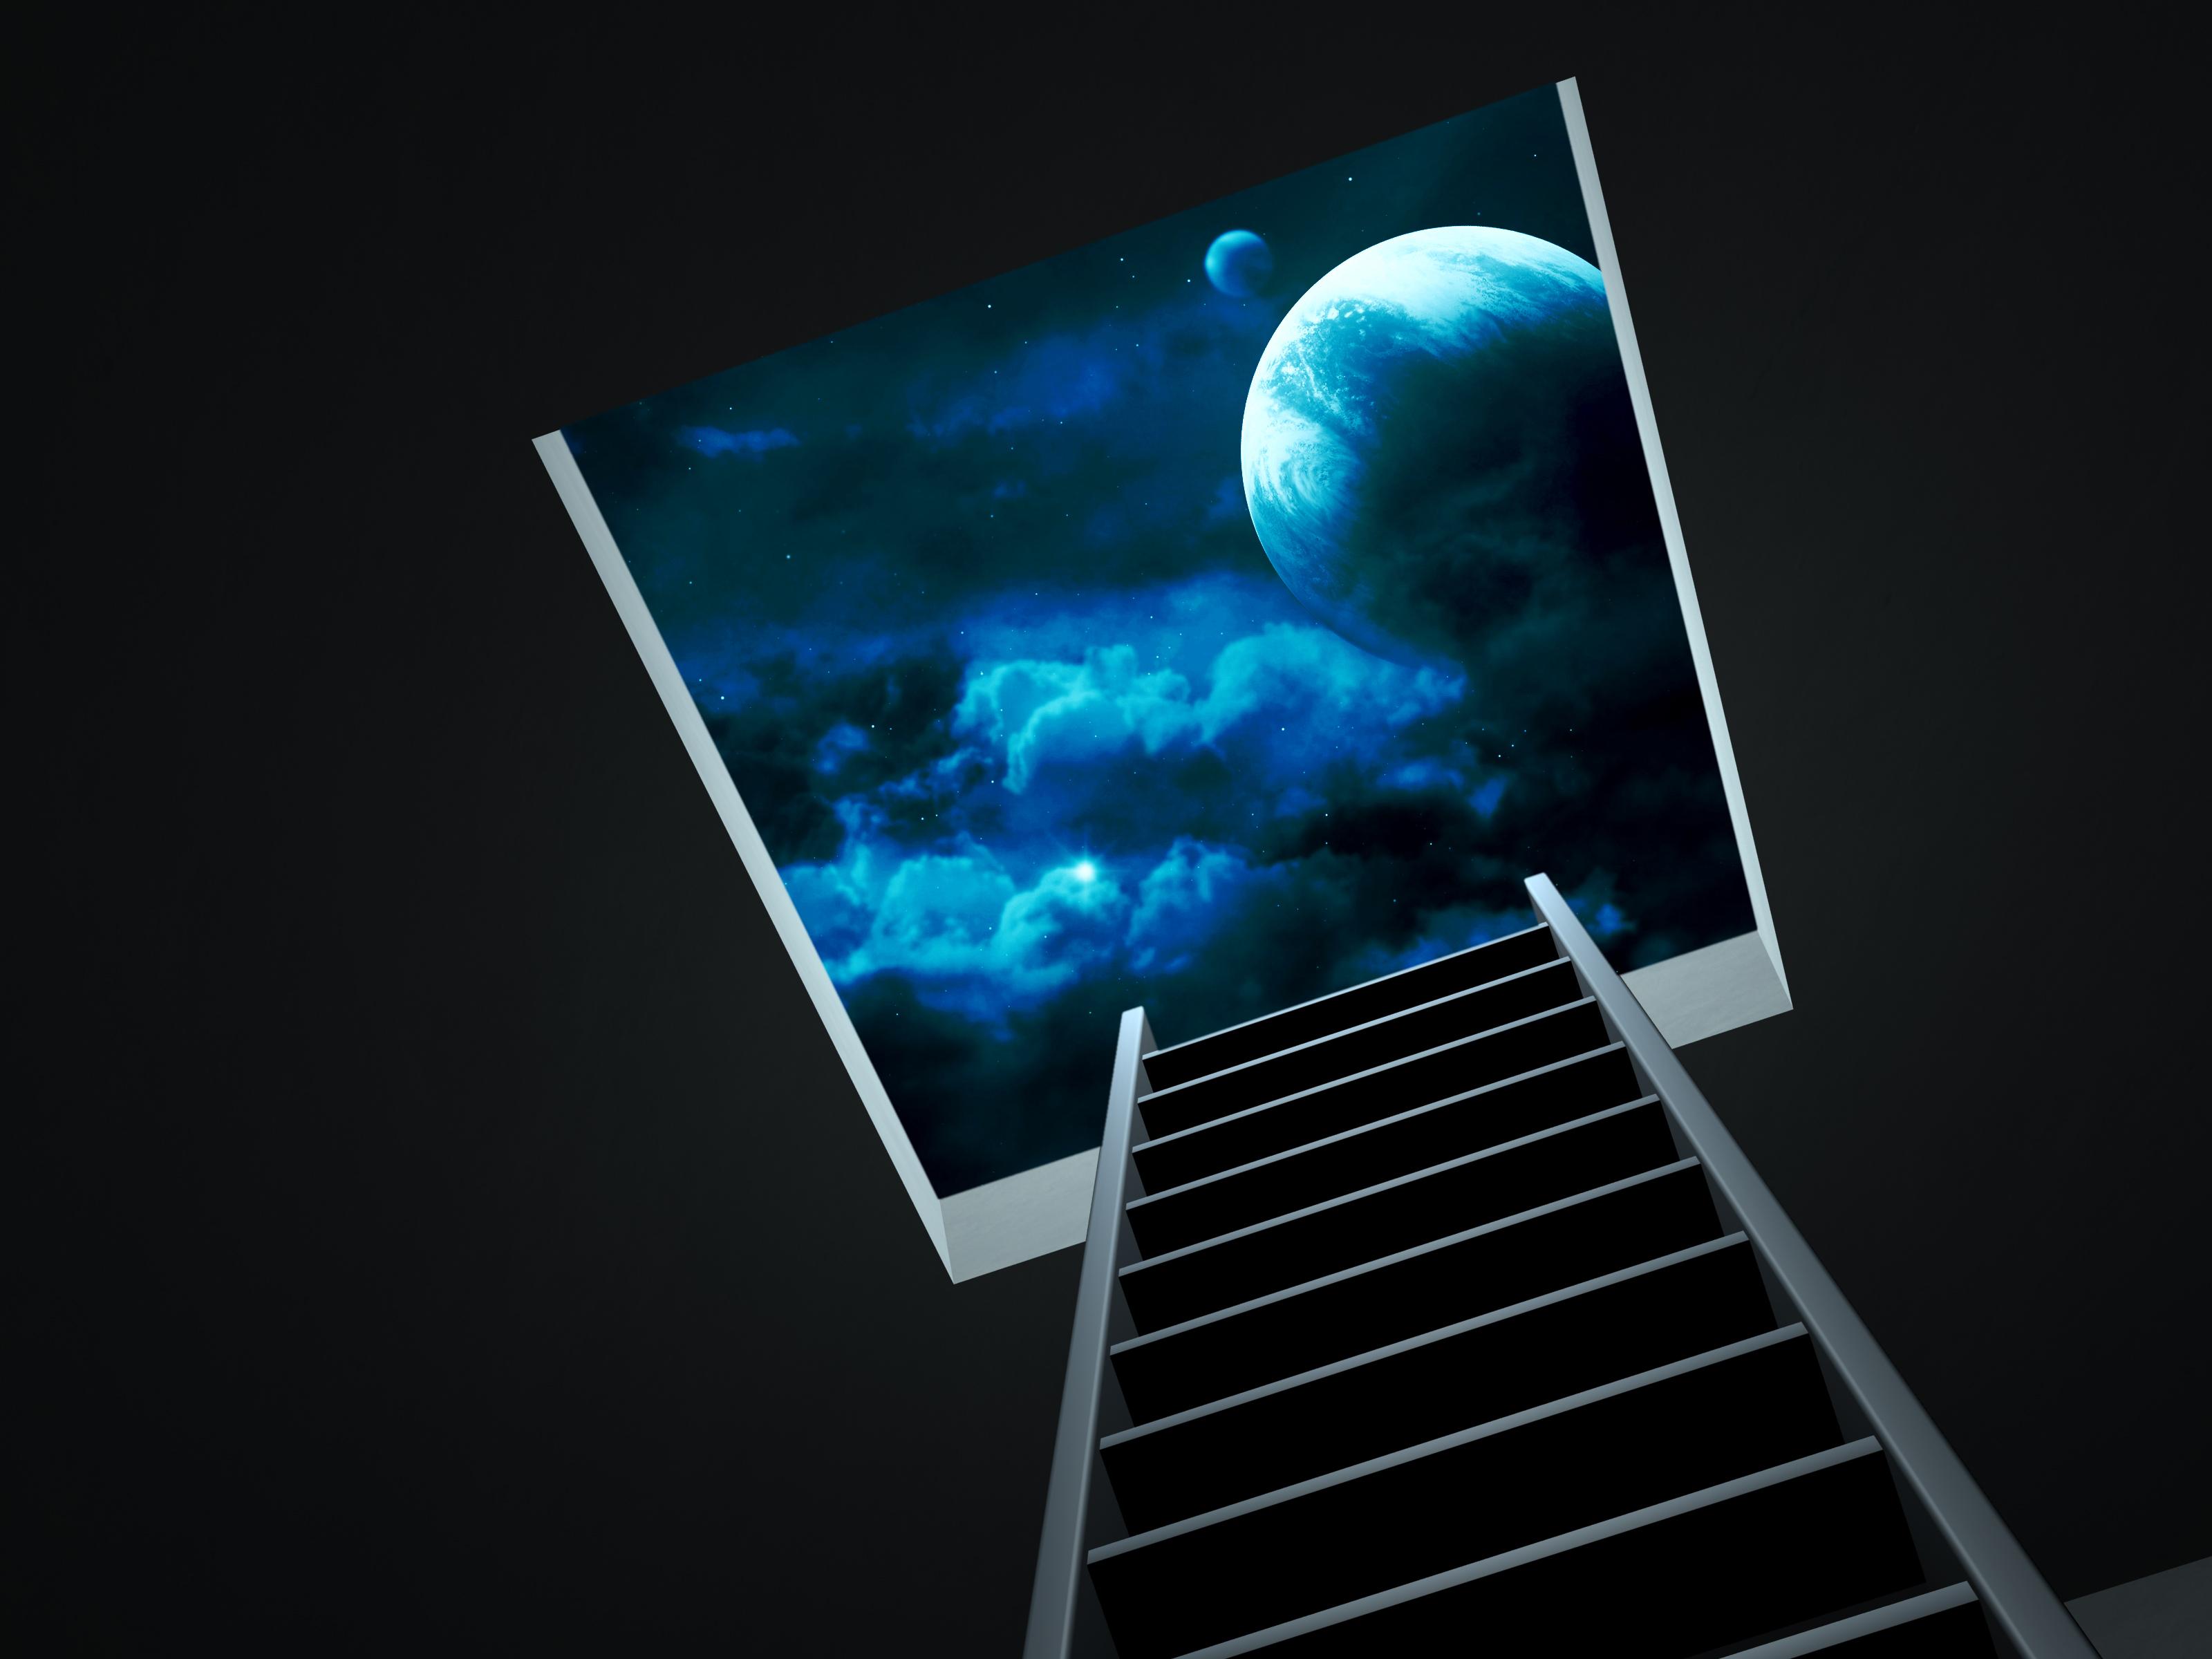 Обои на рабочий стол лестница в небеса